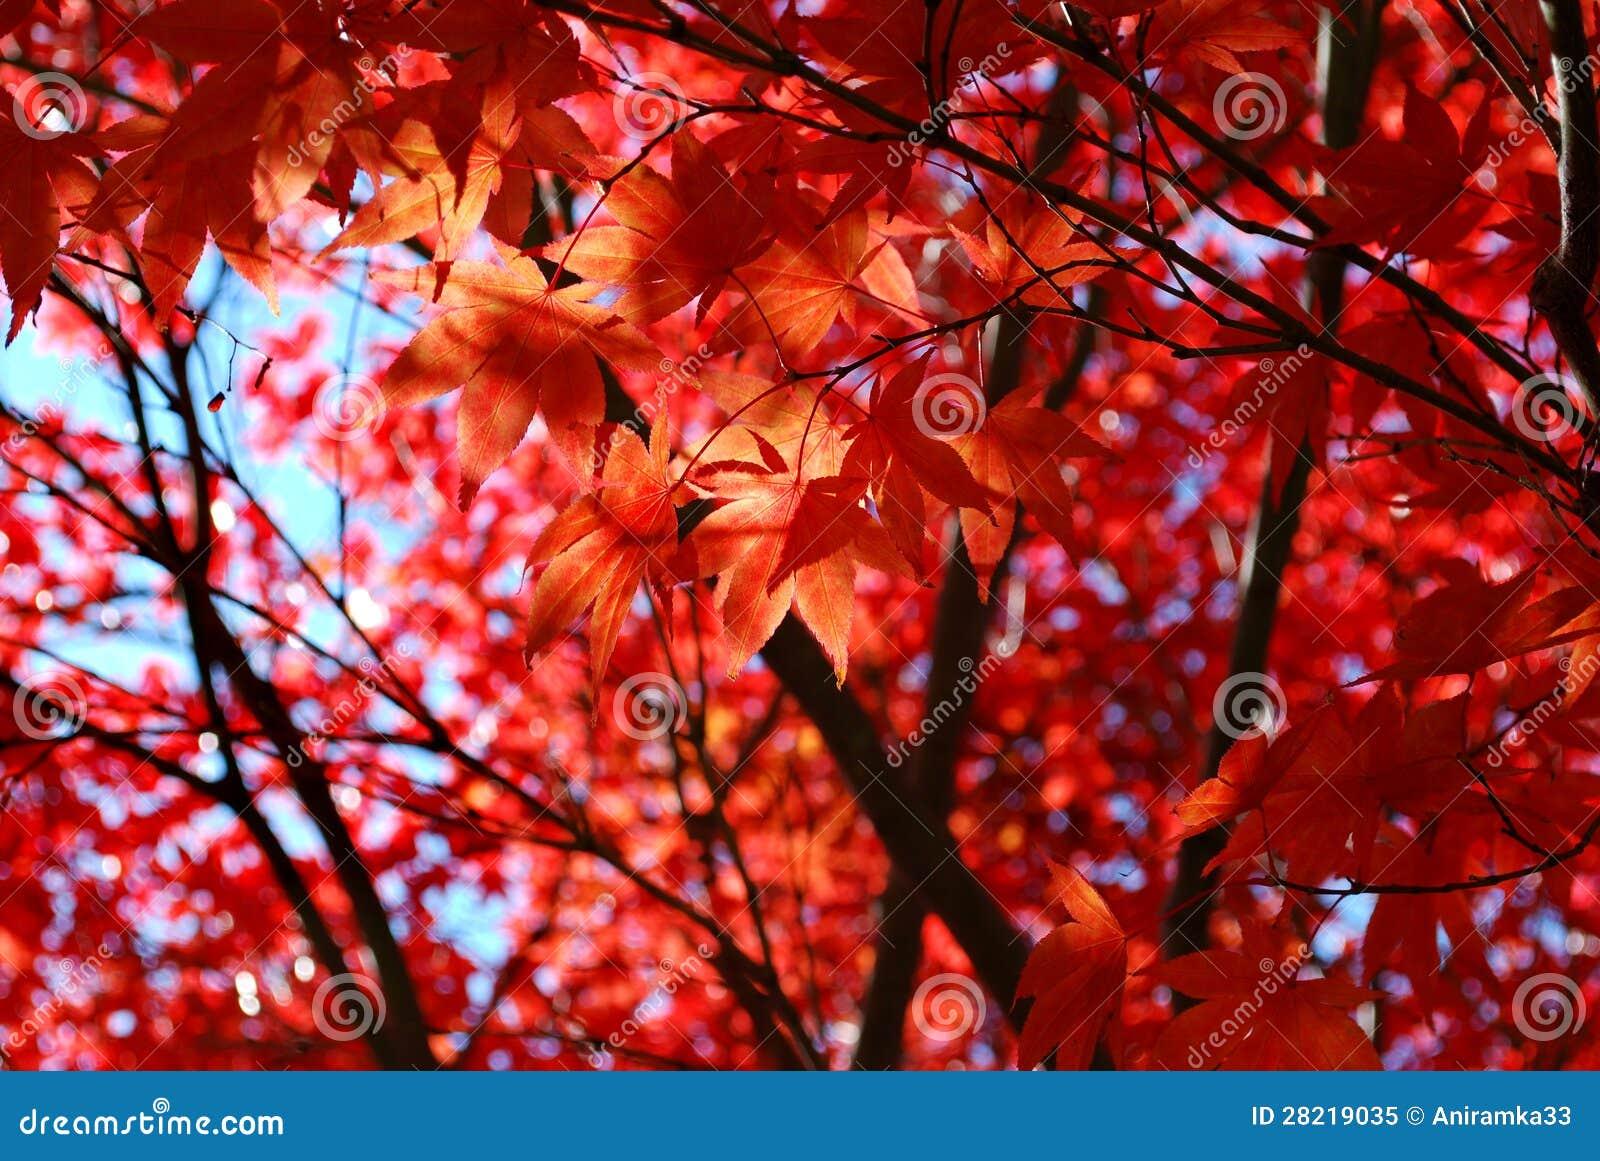 Red Japanese Maple Foliage